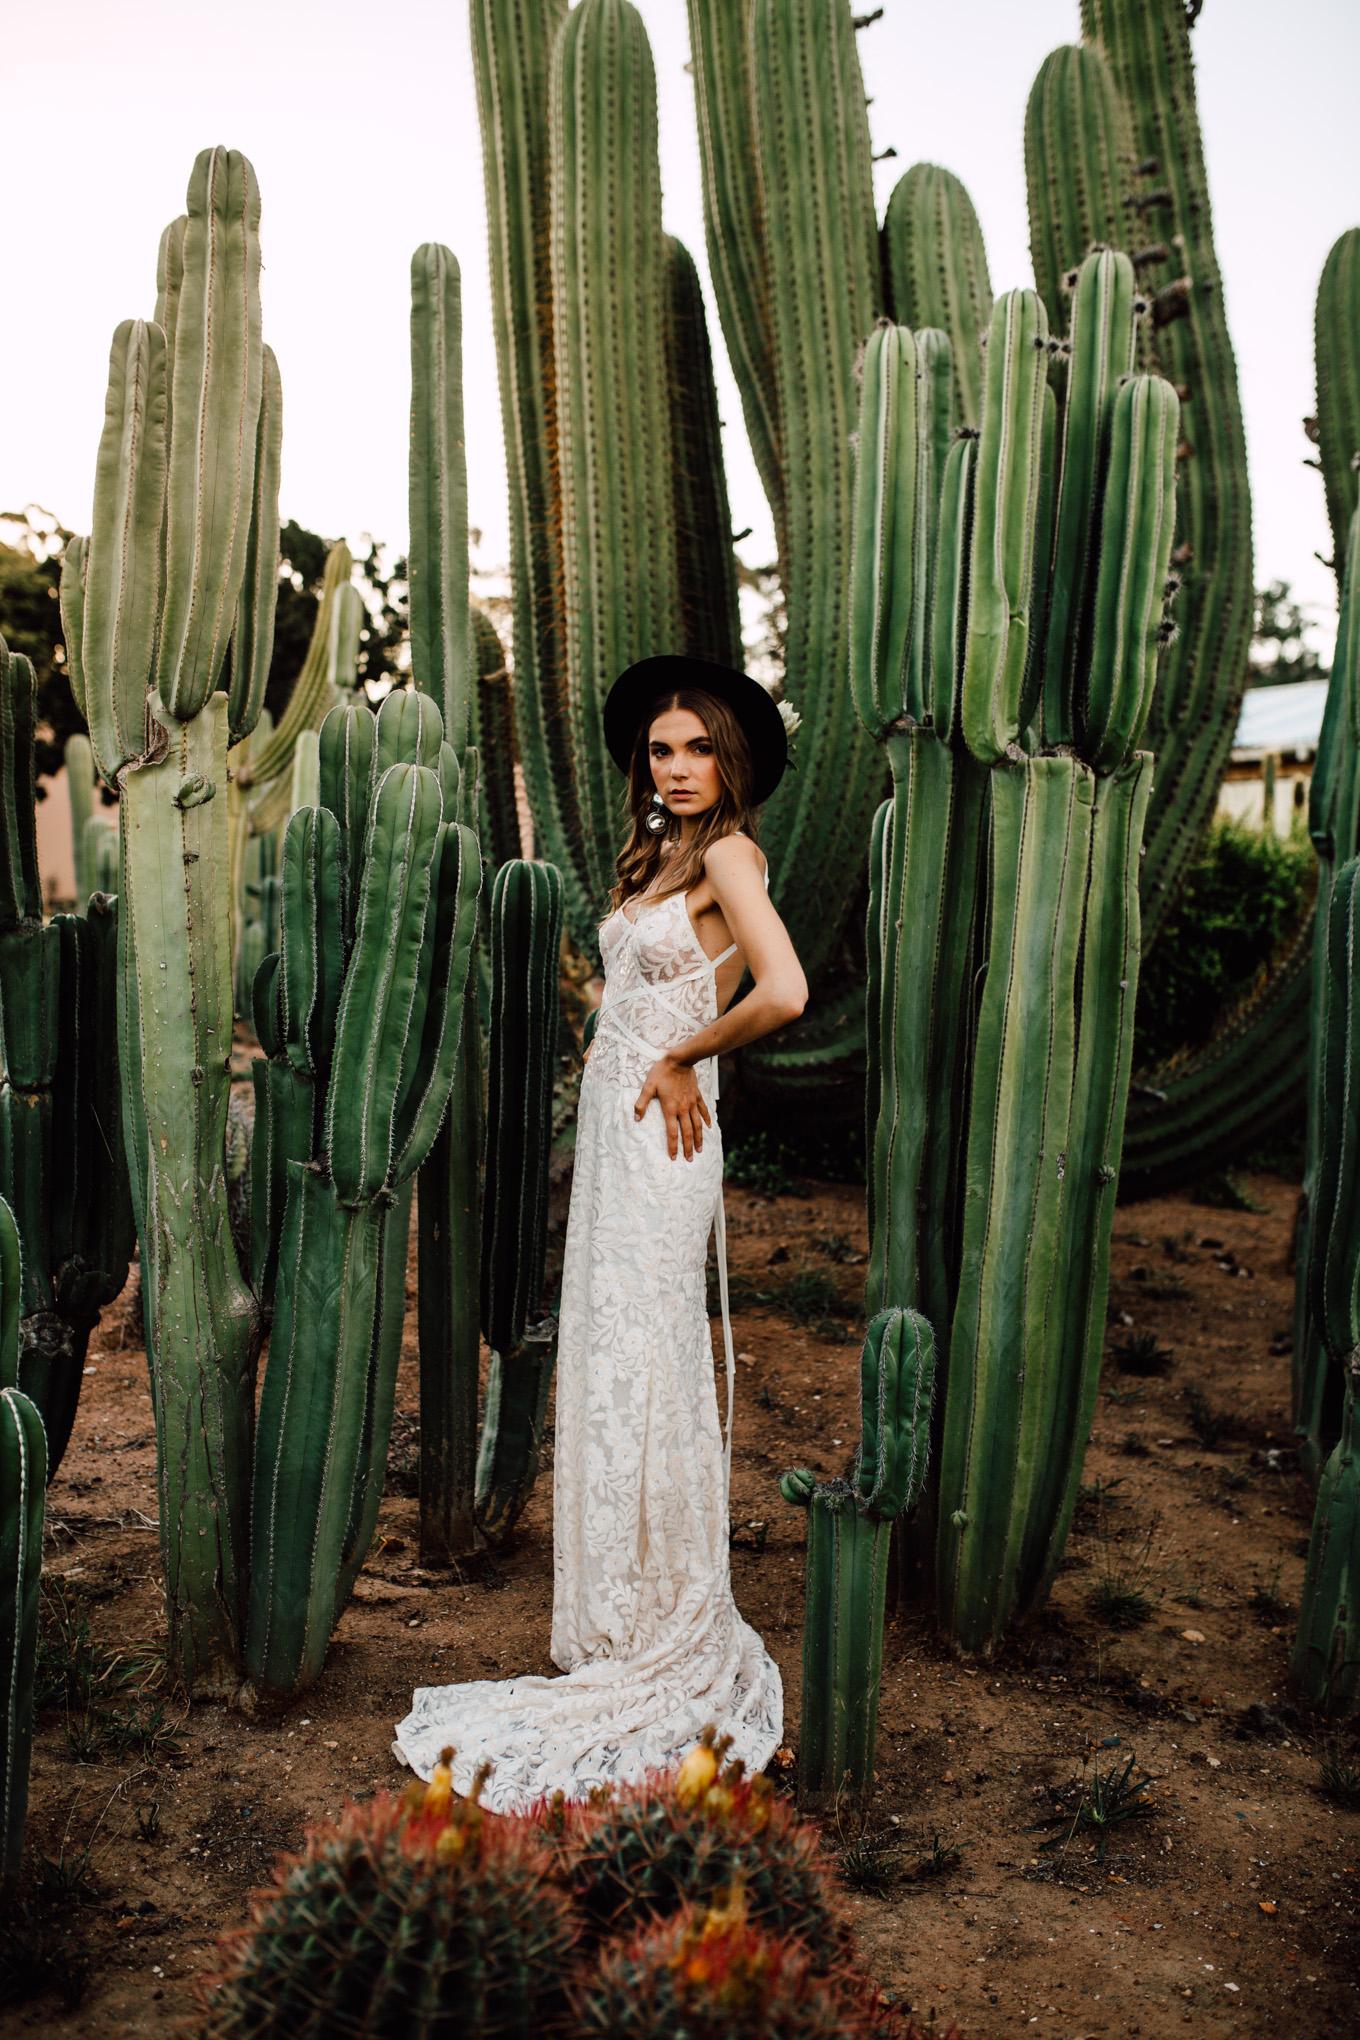 Cape-Town-Pia-Anna-Christian-Wedding-Photography-South-Africa-Bride-Cactus-17.jpg